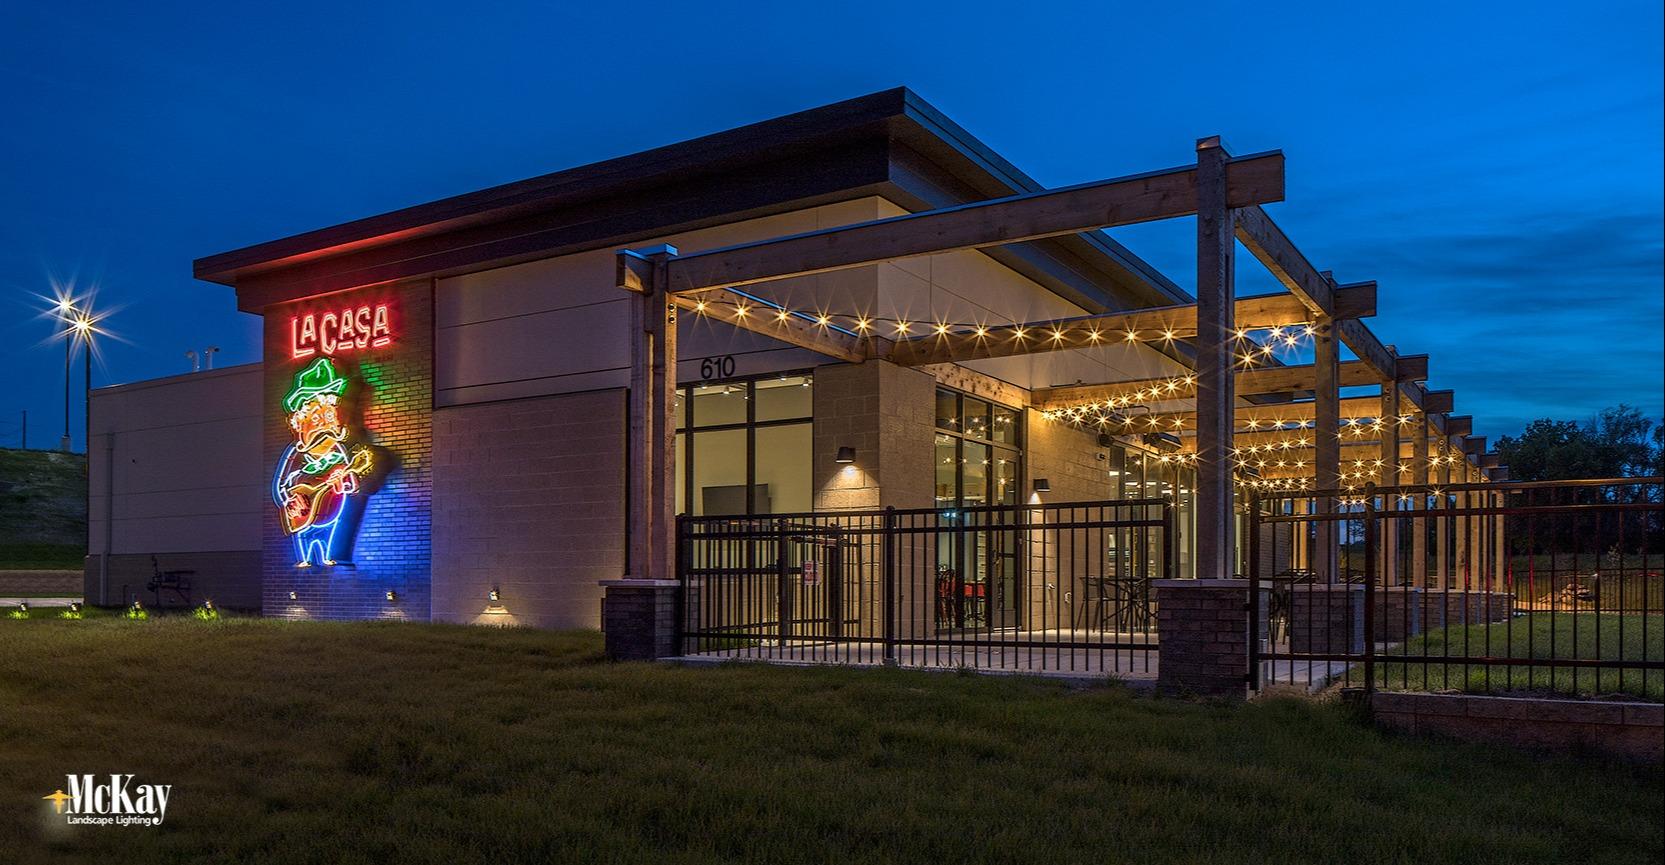 outdoor restaurant patio lighting omaha nebraska La Casa McKay Landscape LightingL 02